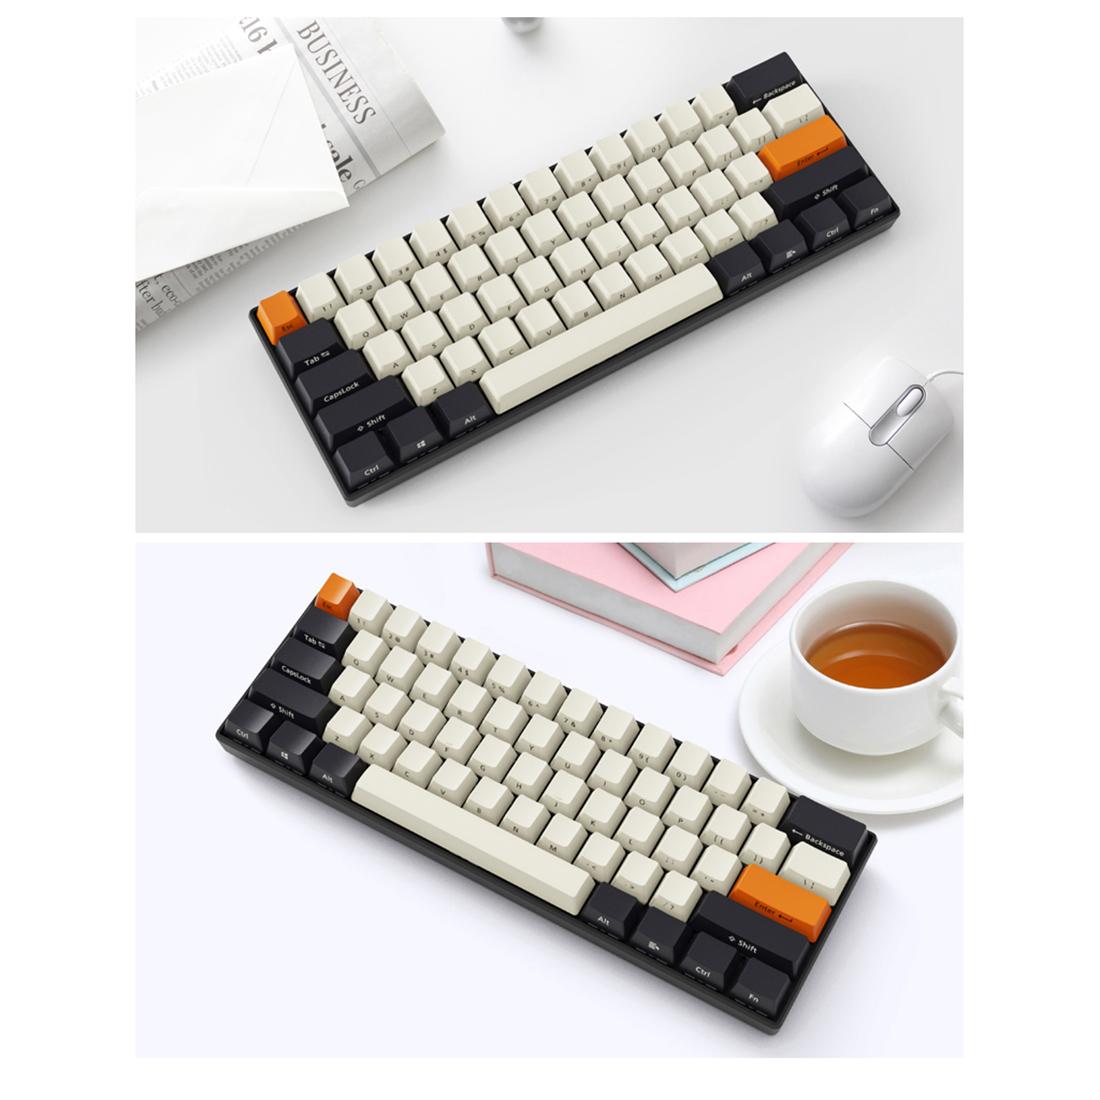 61 Keys 60% Mechanical Gaming Keyboard PBT Keycaps Wireless Bluetooth RGB Ultra-Compact